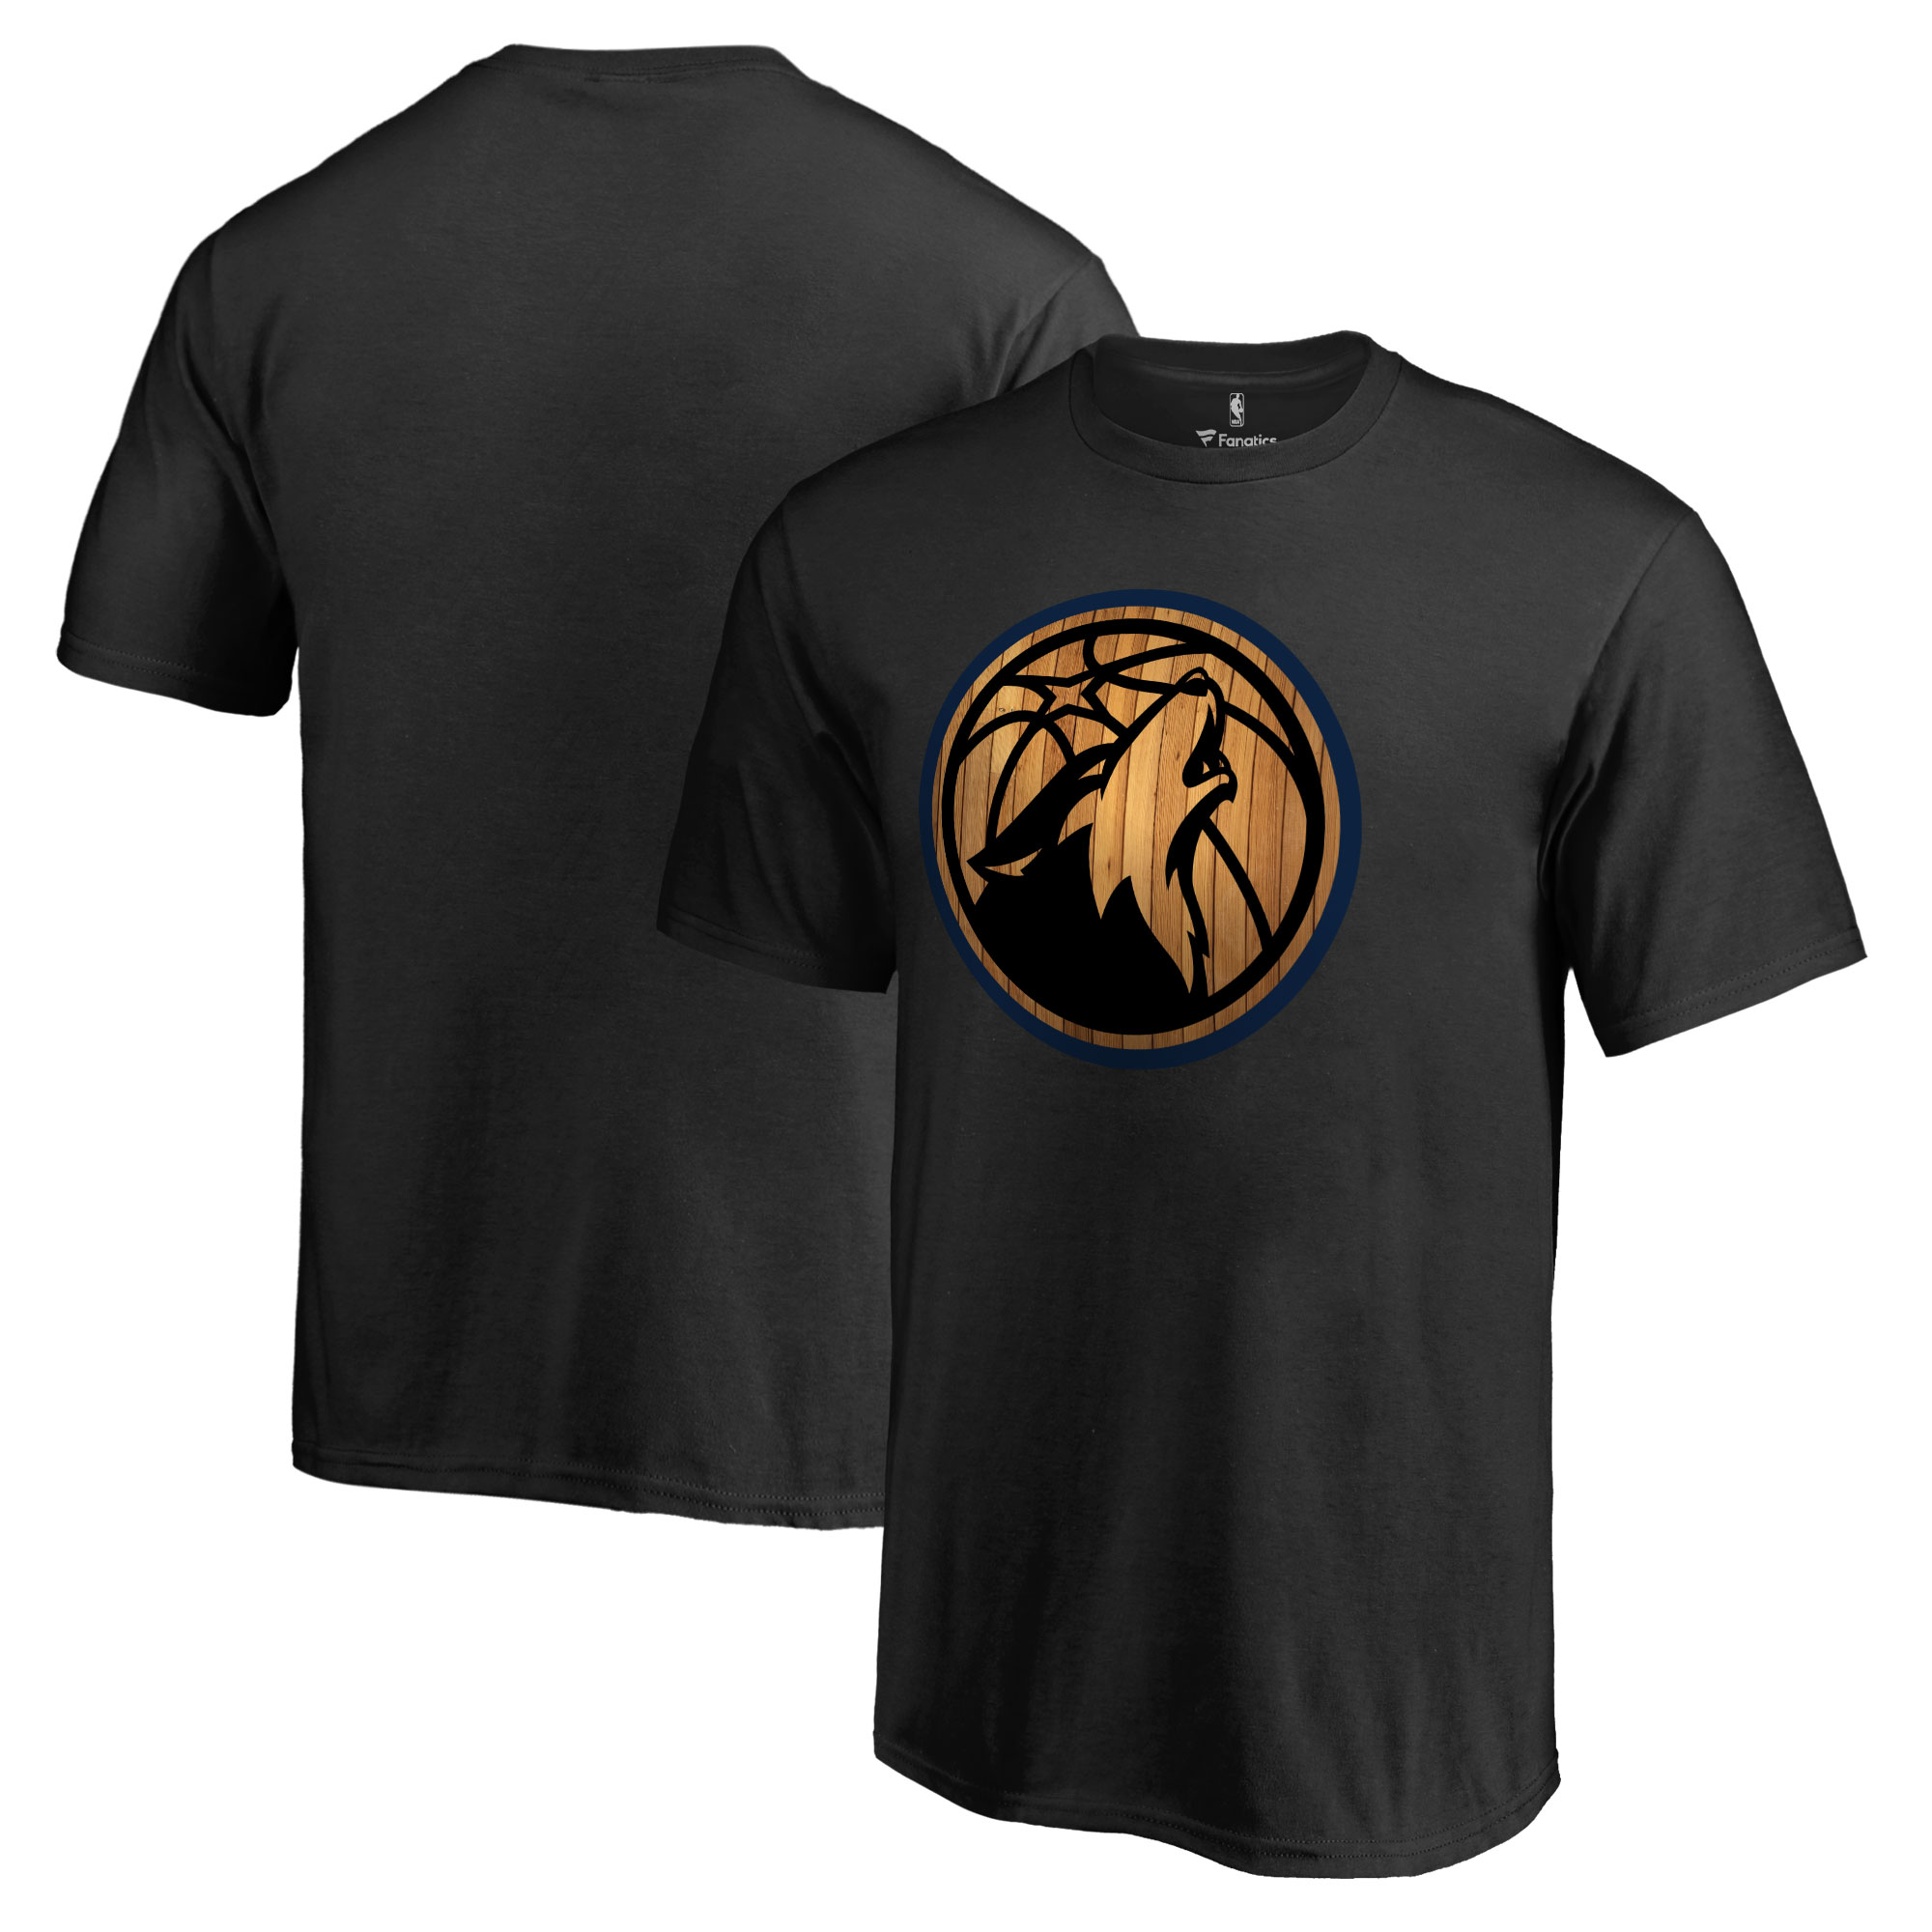 Minnesota Timberwolves Youth Hardwood T-Shirt - Black